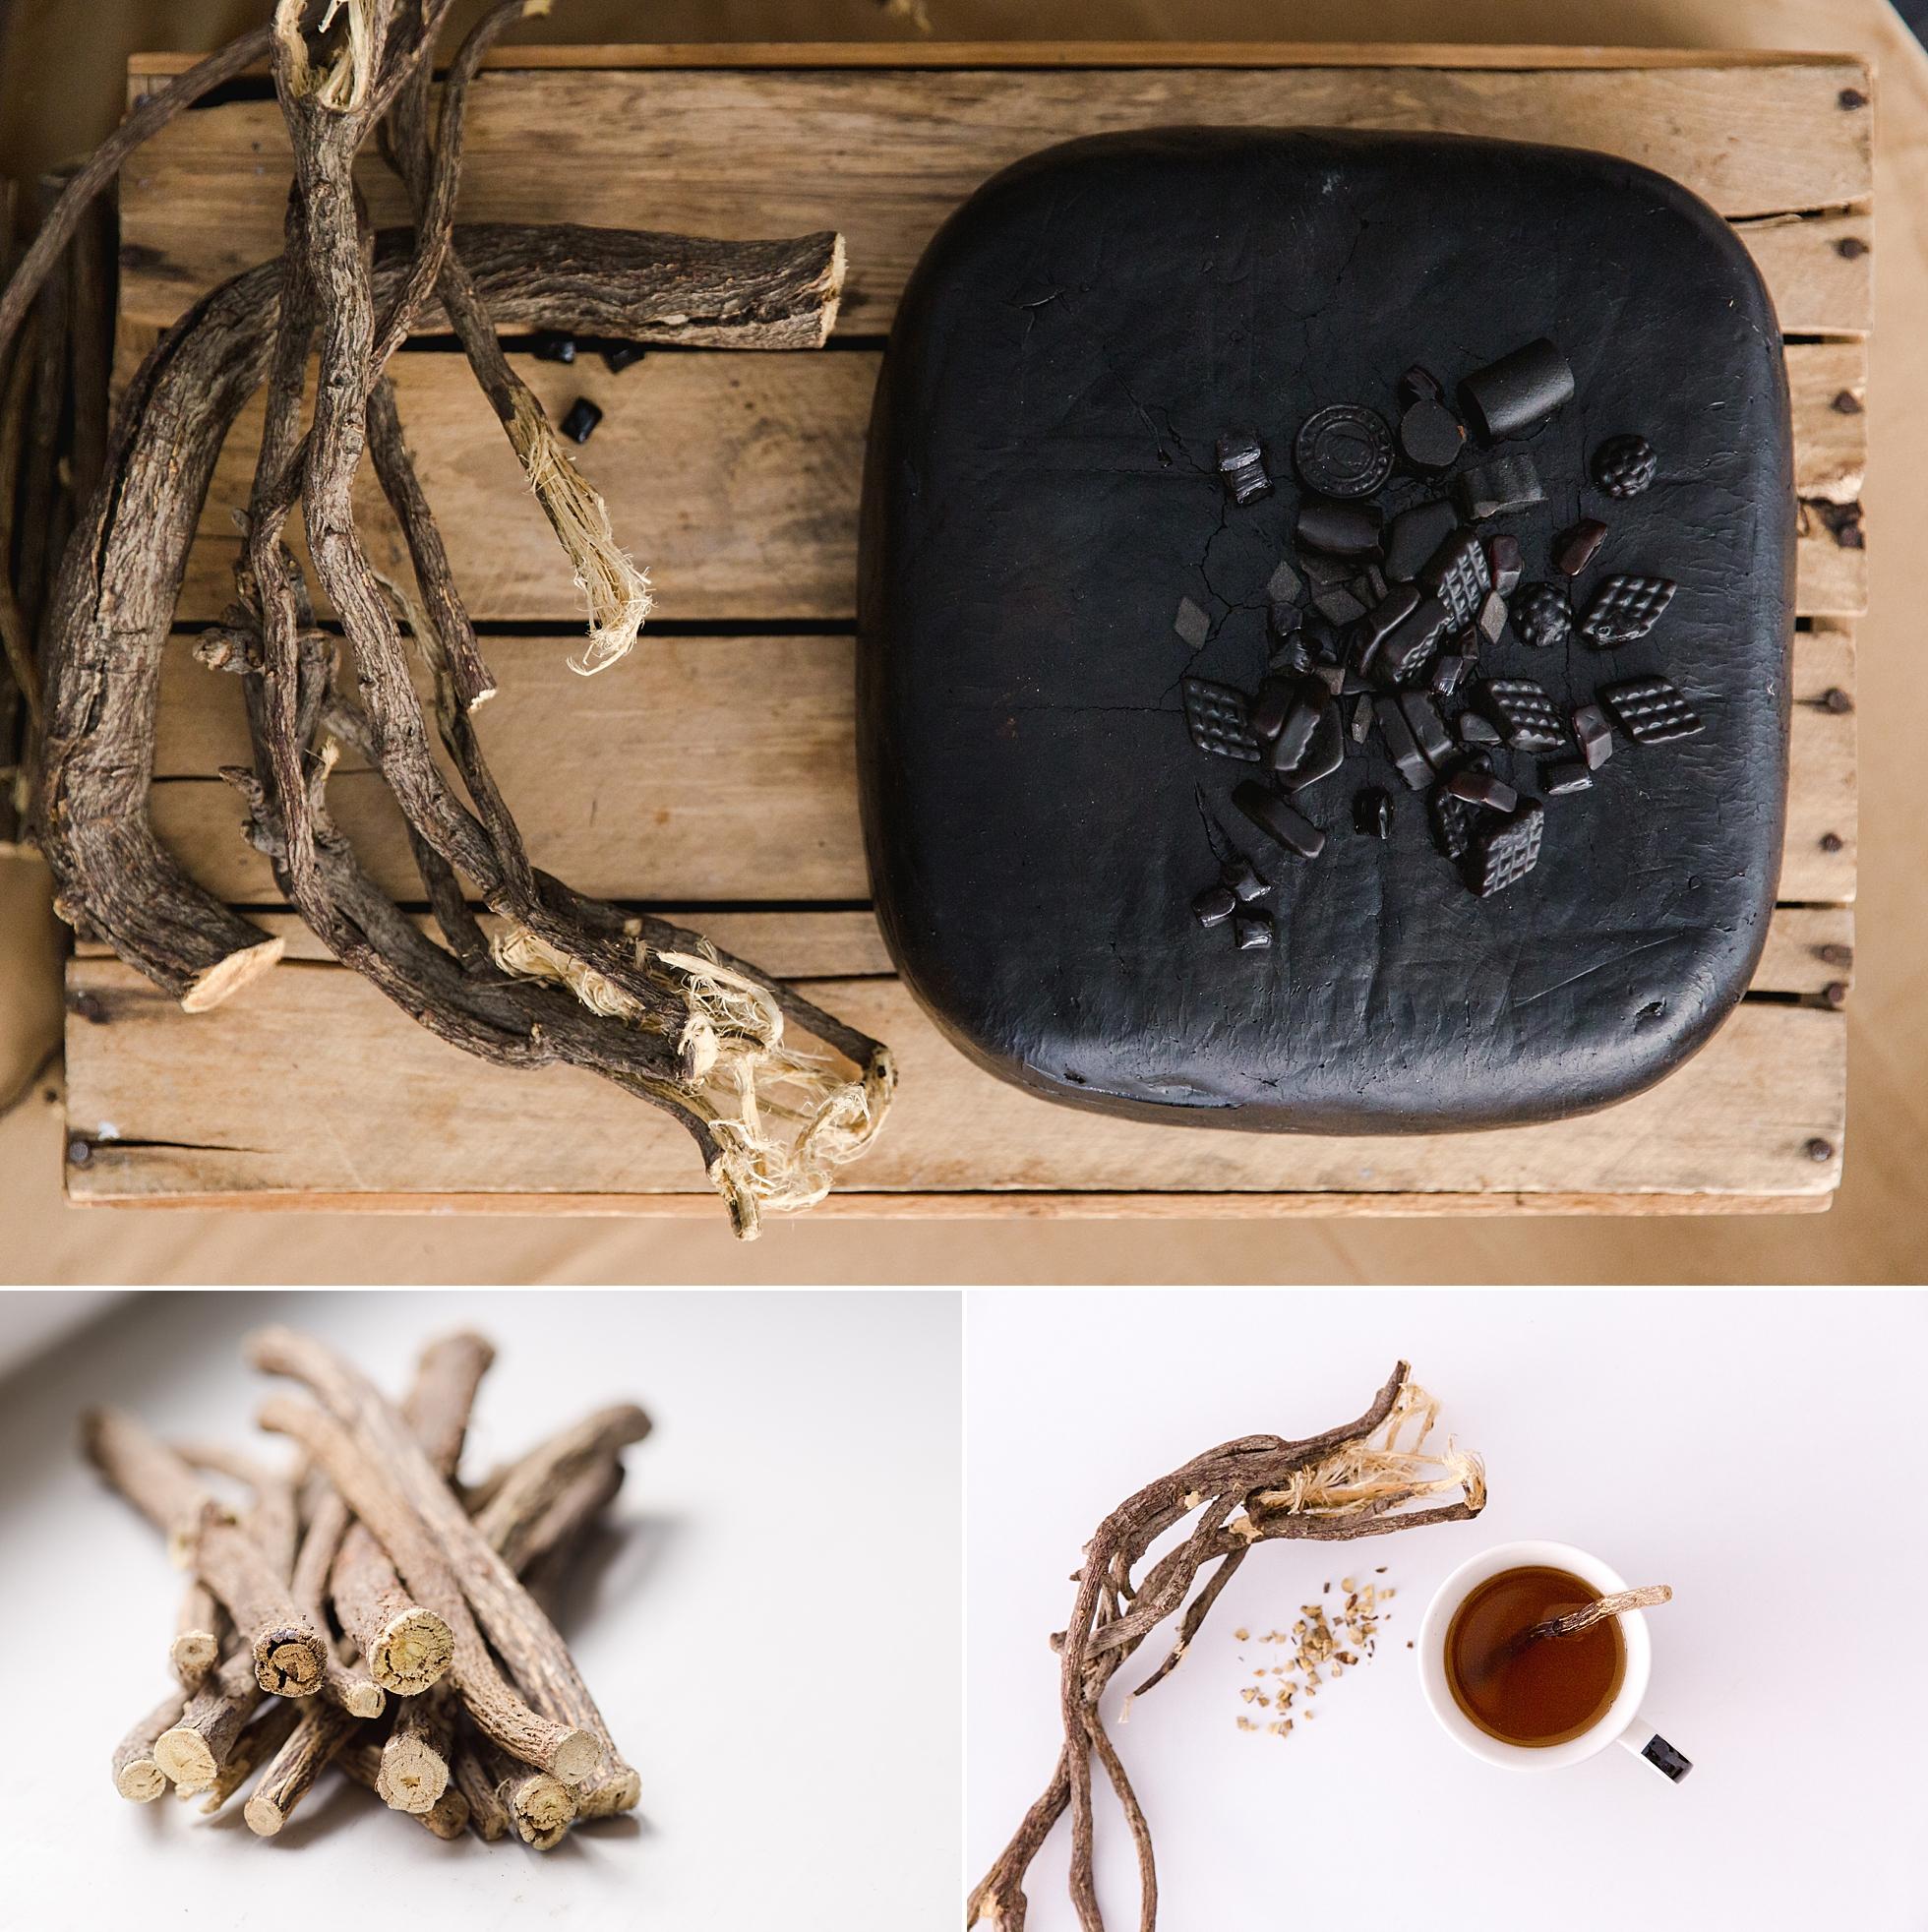 Natural photos of licorice root, licorice tea and licorice